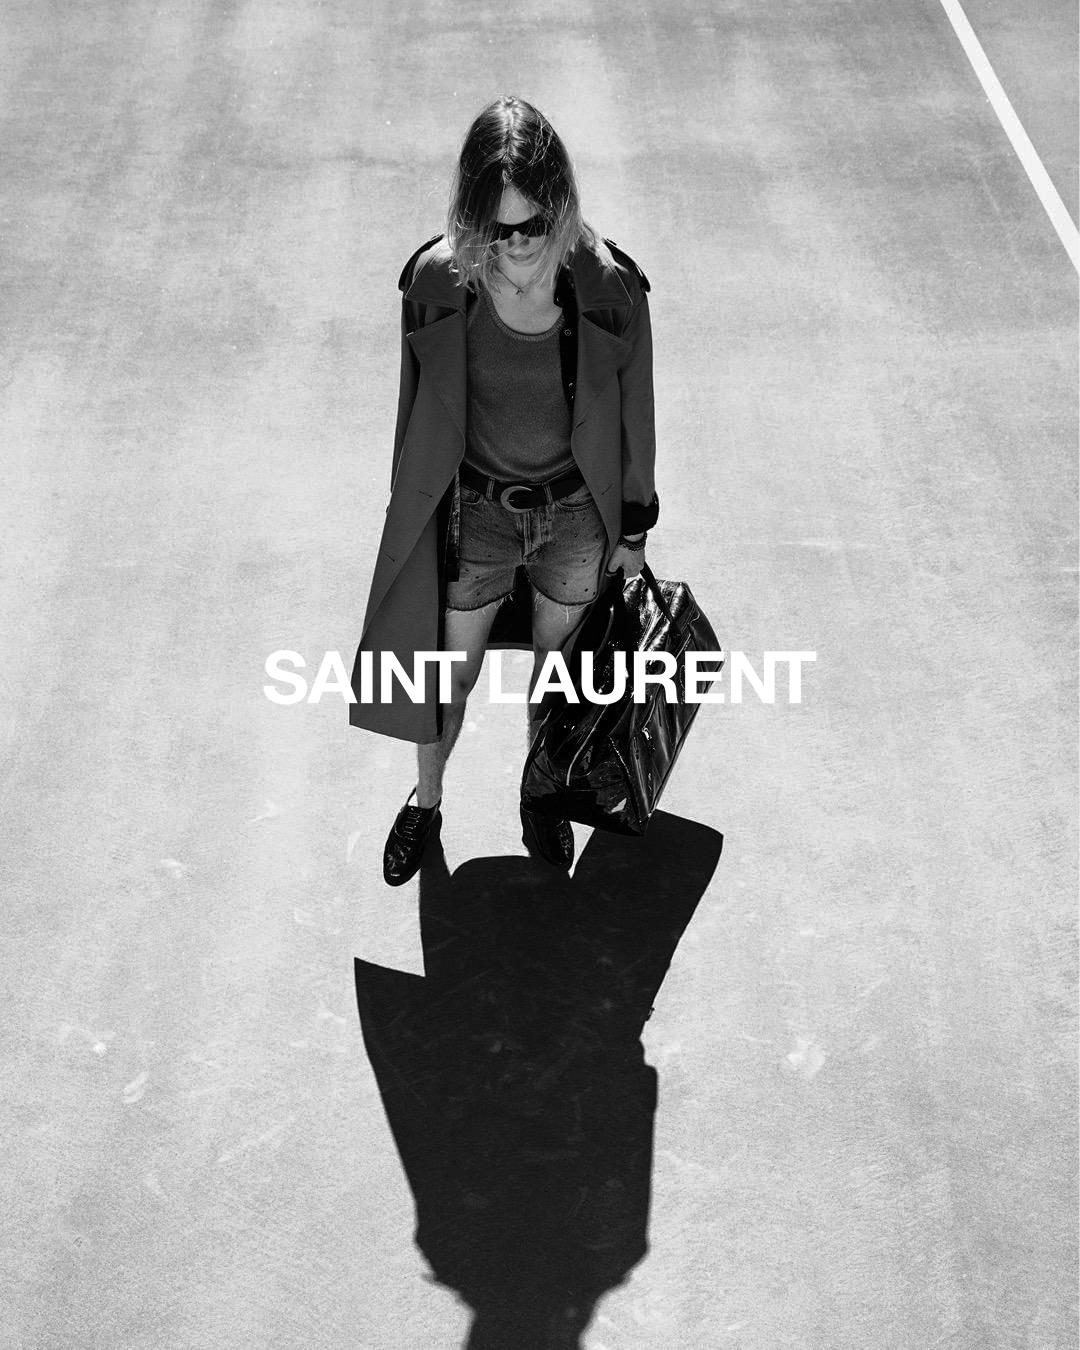 Saint Laurent Spring/Summer 2020 Campaign